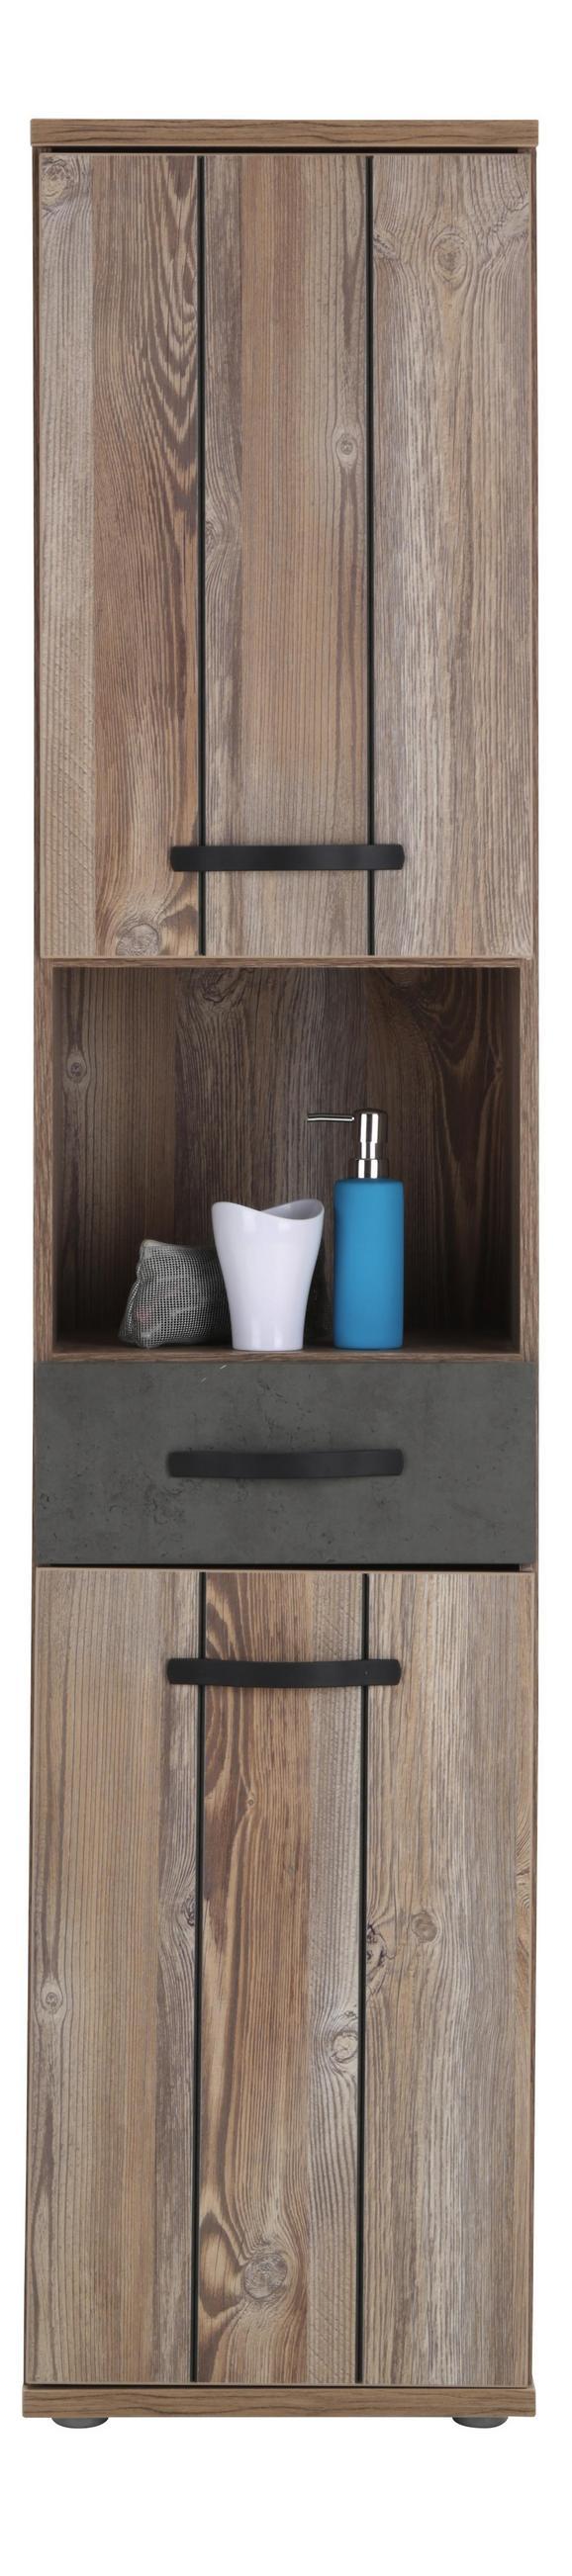 Visoka Omara Catherine - temno siva/bor, Moderno, kovina/umetna masa (41/183/35cm) - Mömax modern living